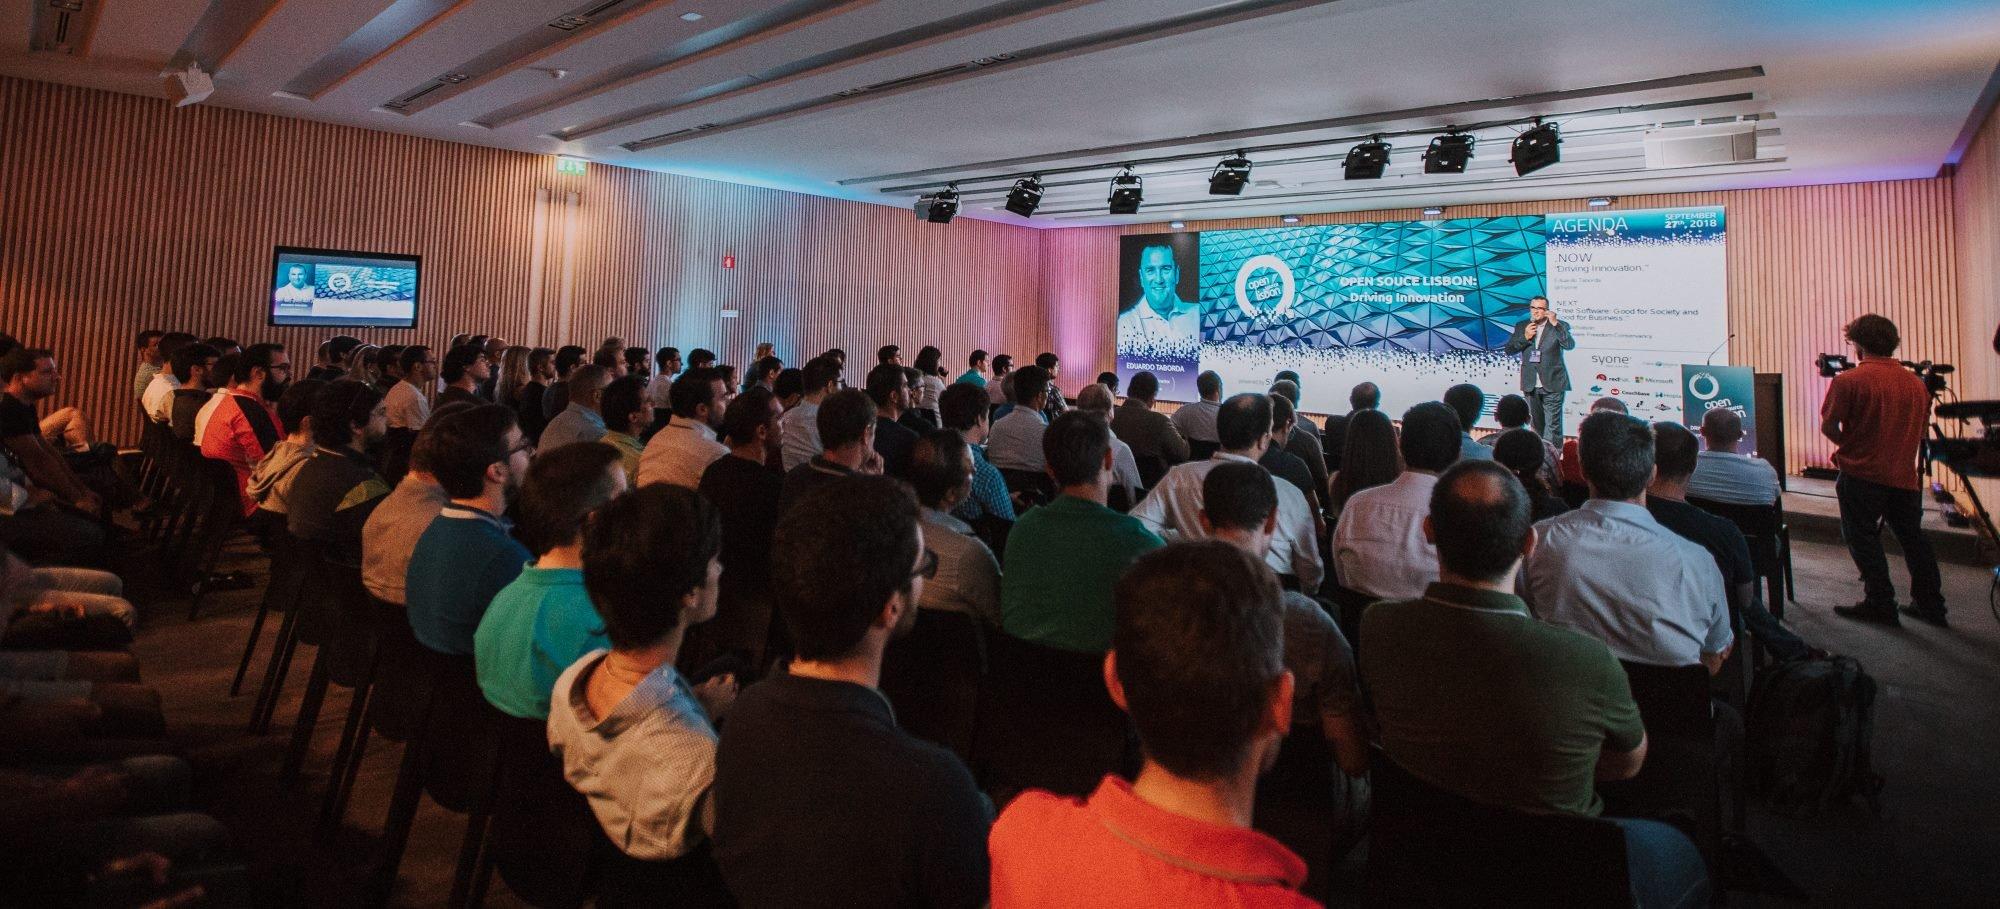 Open Source Lisbon 2018